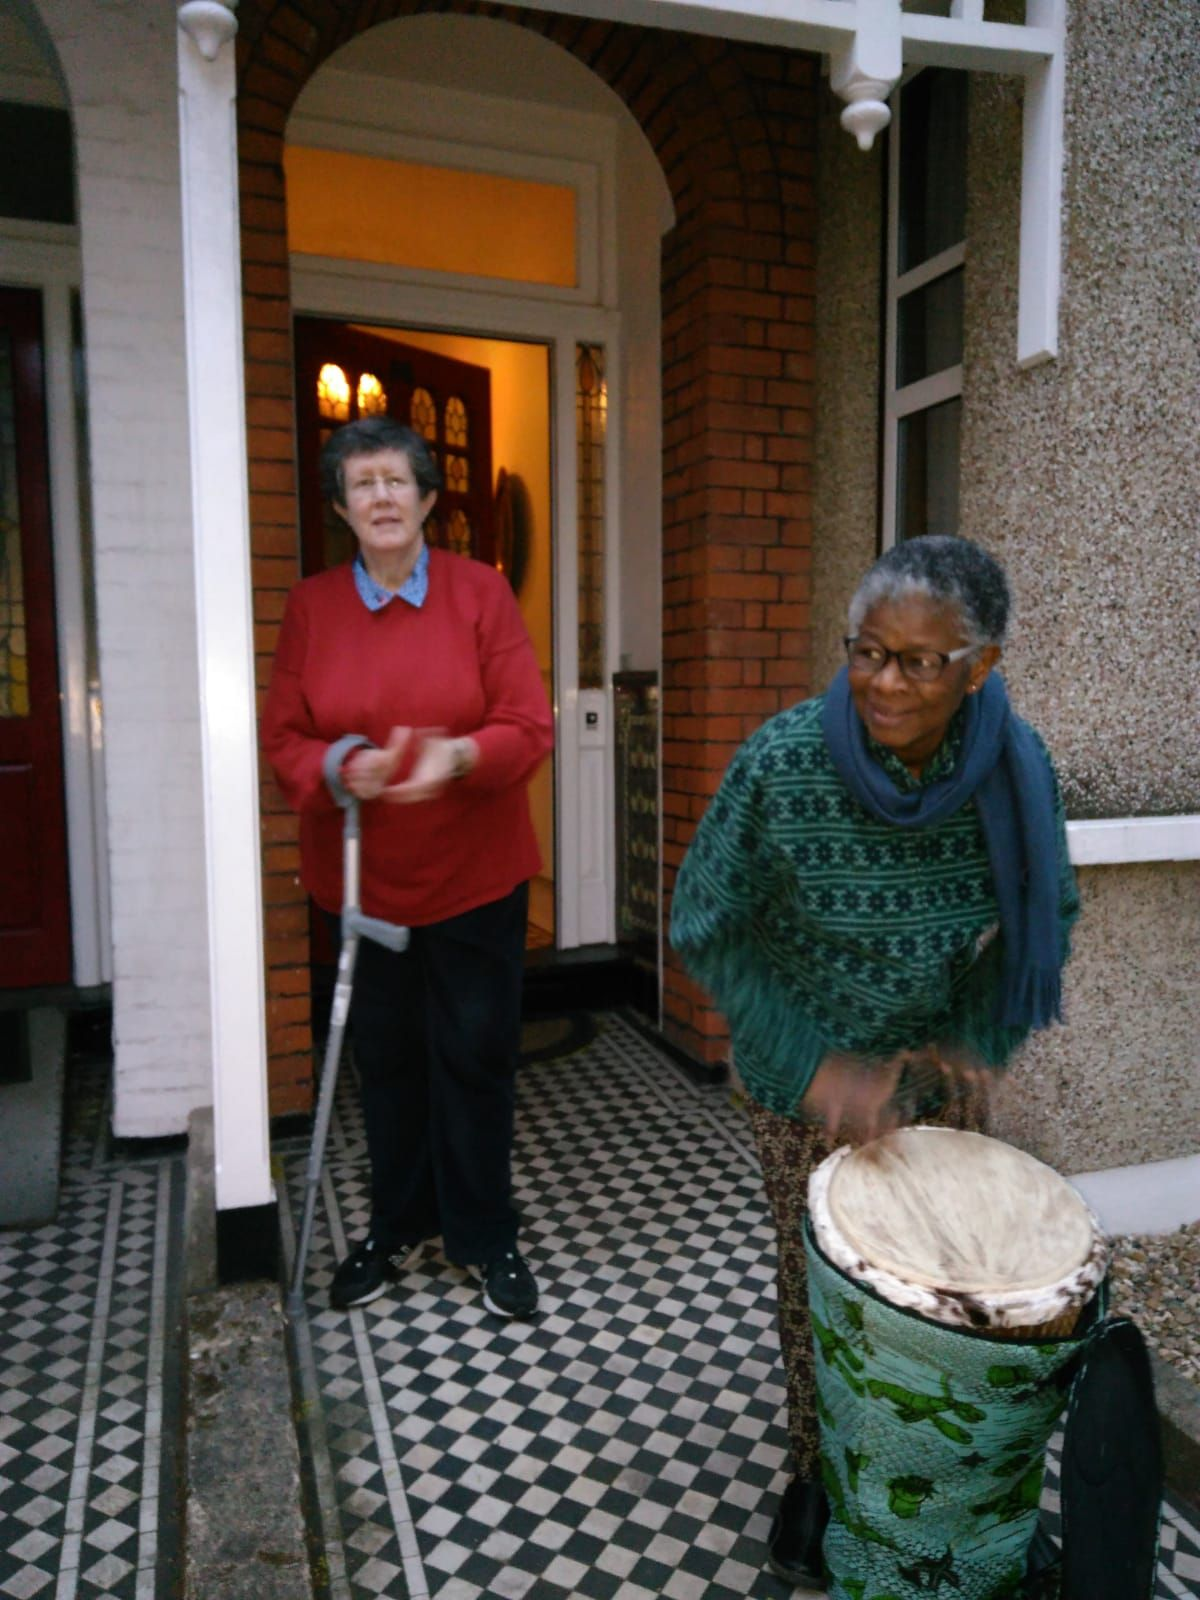 Society Leadership Team Members Rosemary Ryan (Left) and Edith Dug-yi (Right).